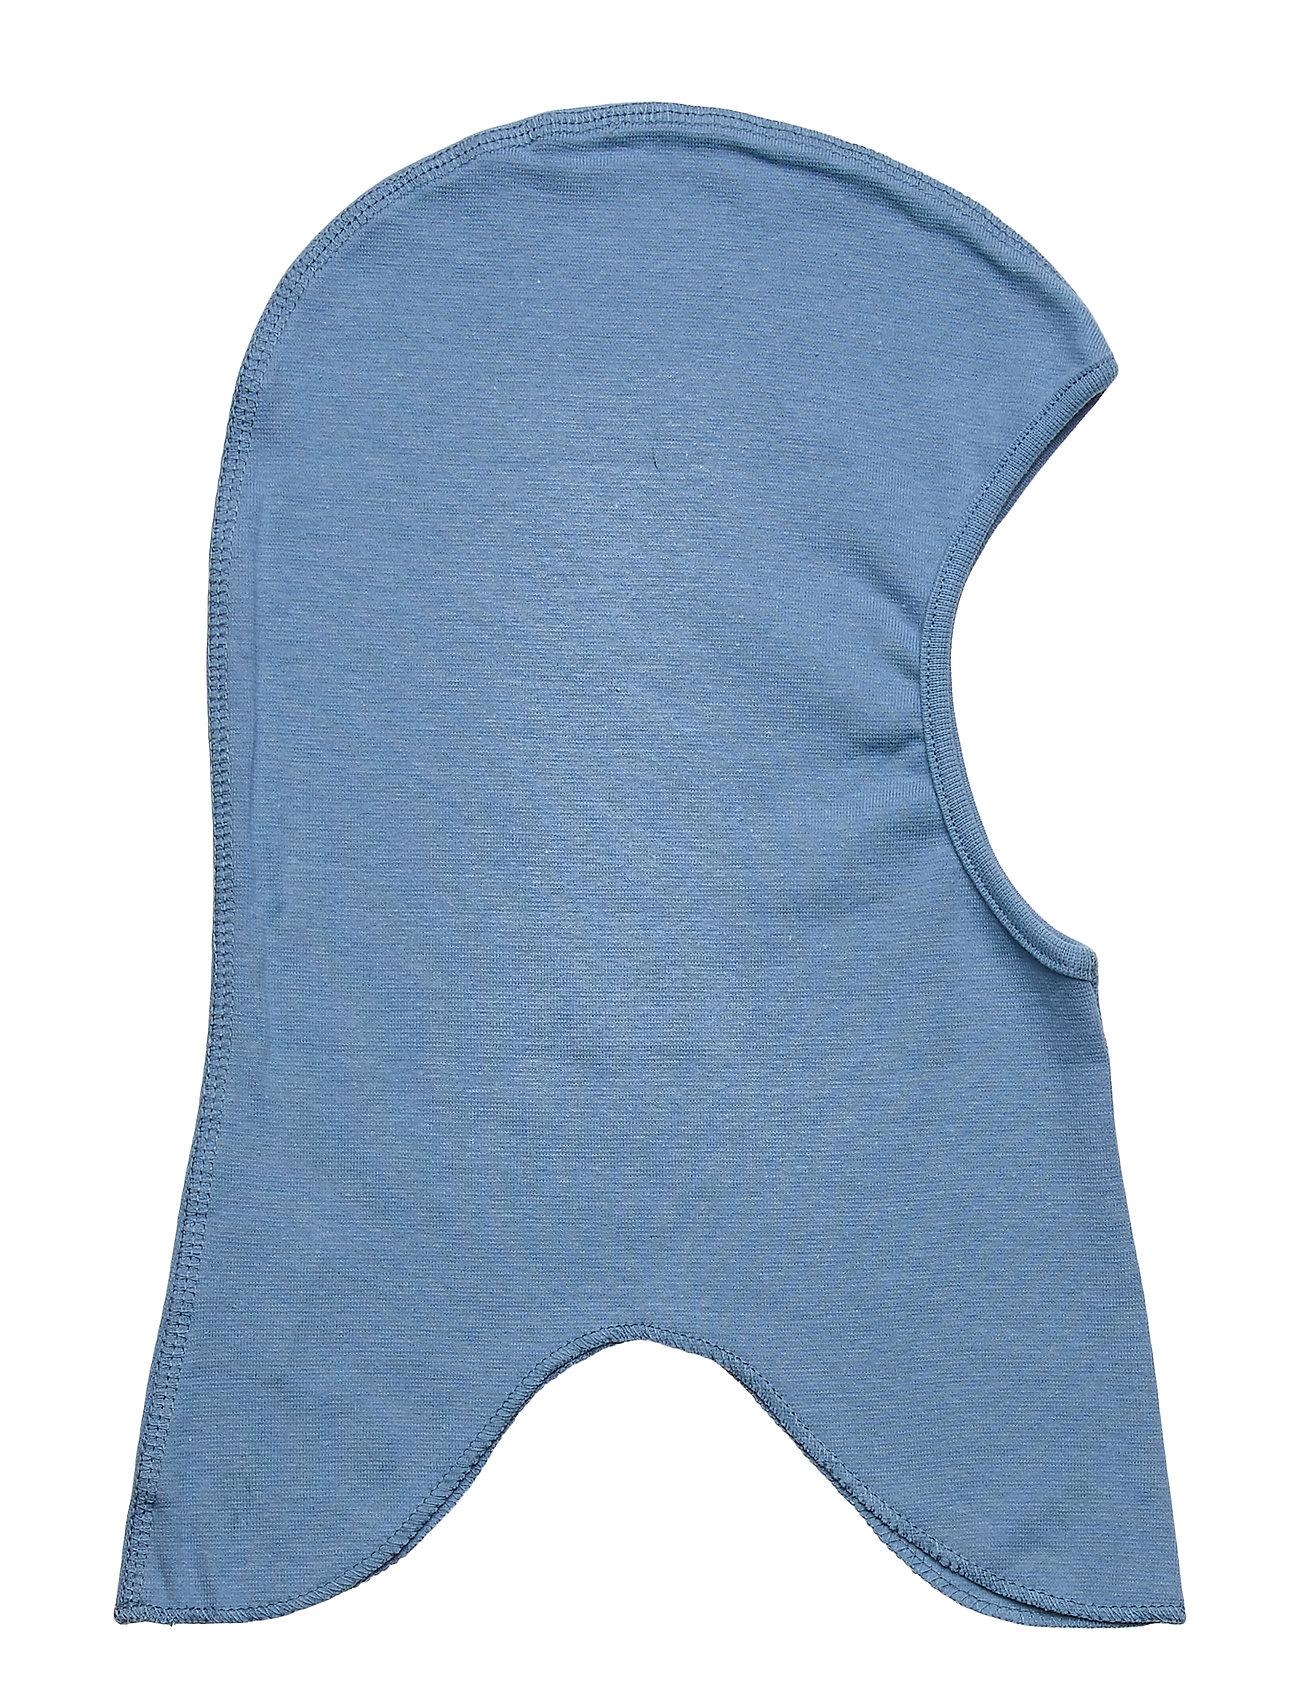 Image of Cotton Fullface - Solid Accessories Headwear Balaclava Blå Mikk-Line (3406311215)